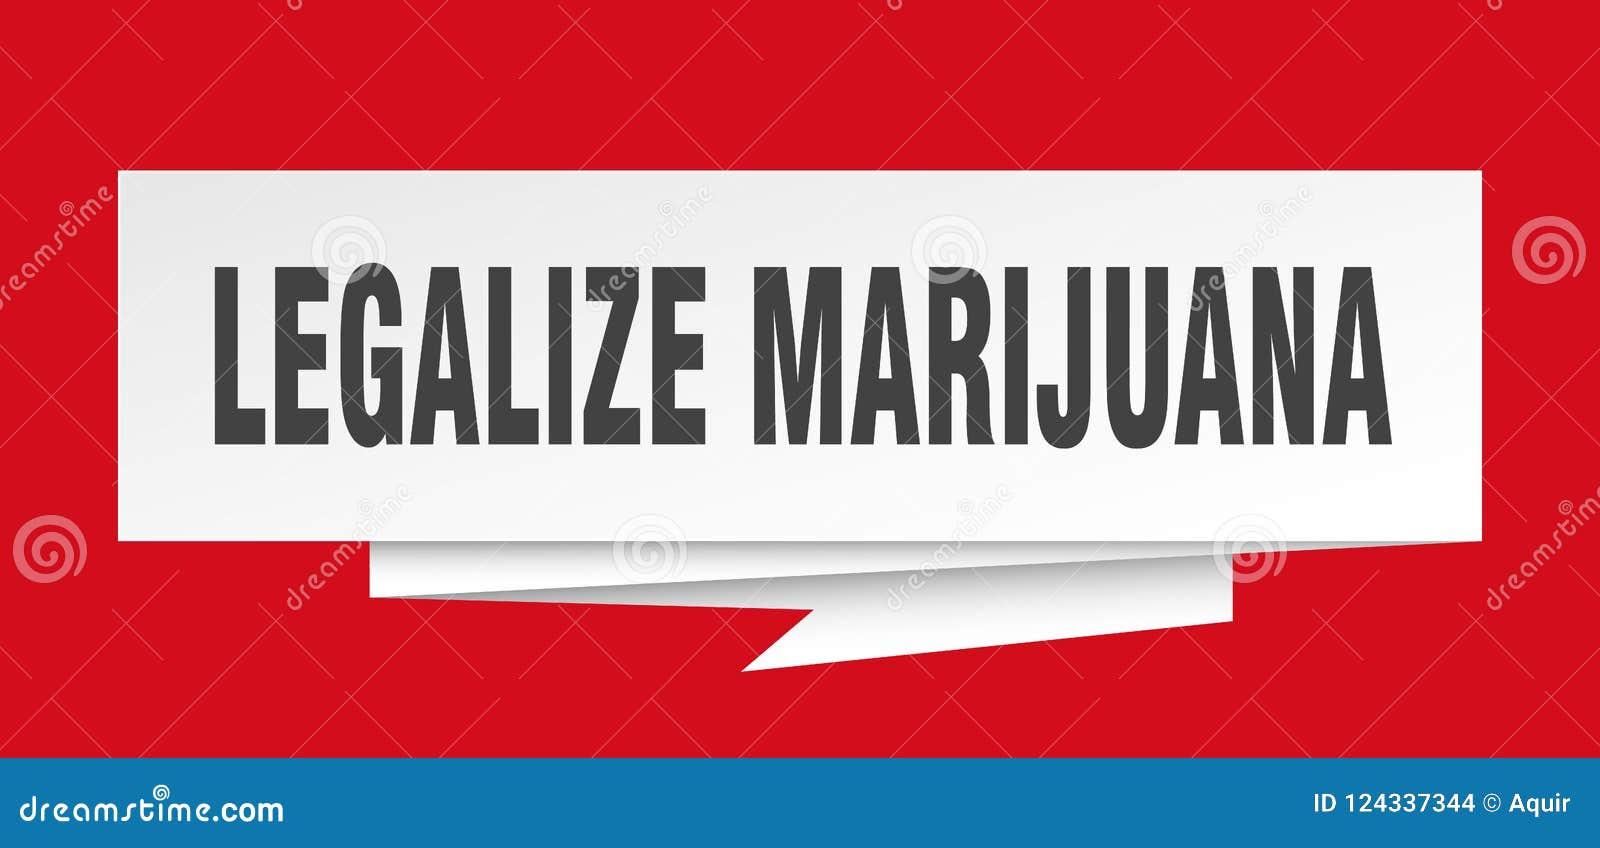 Legalice la marijuana